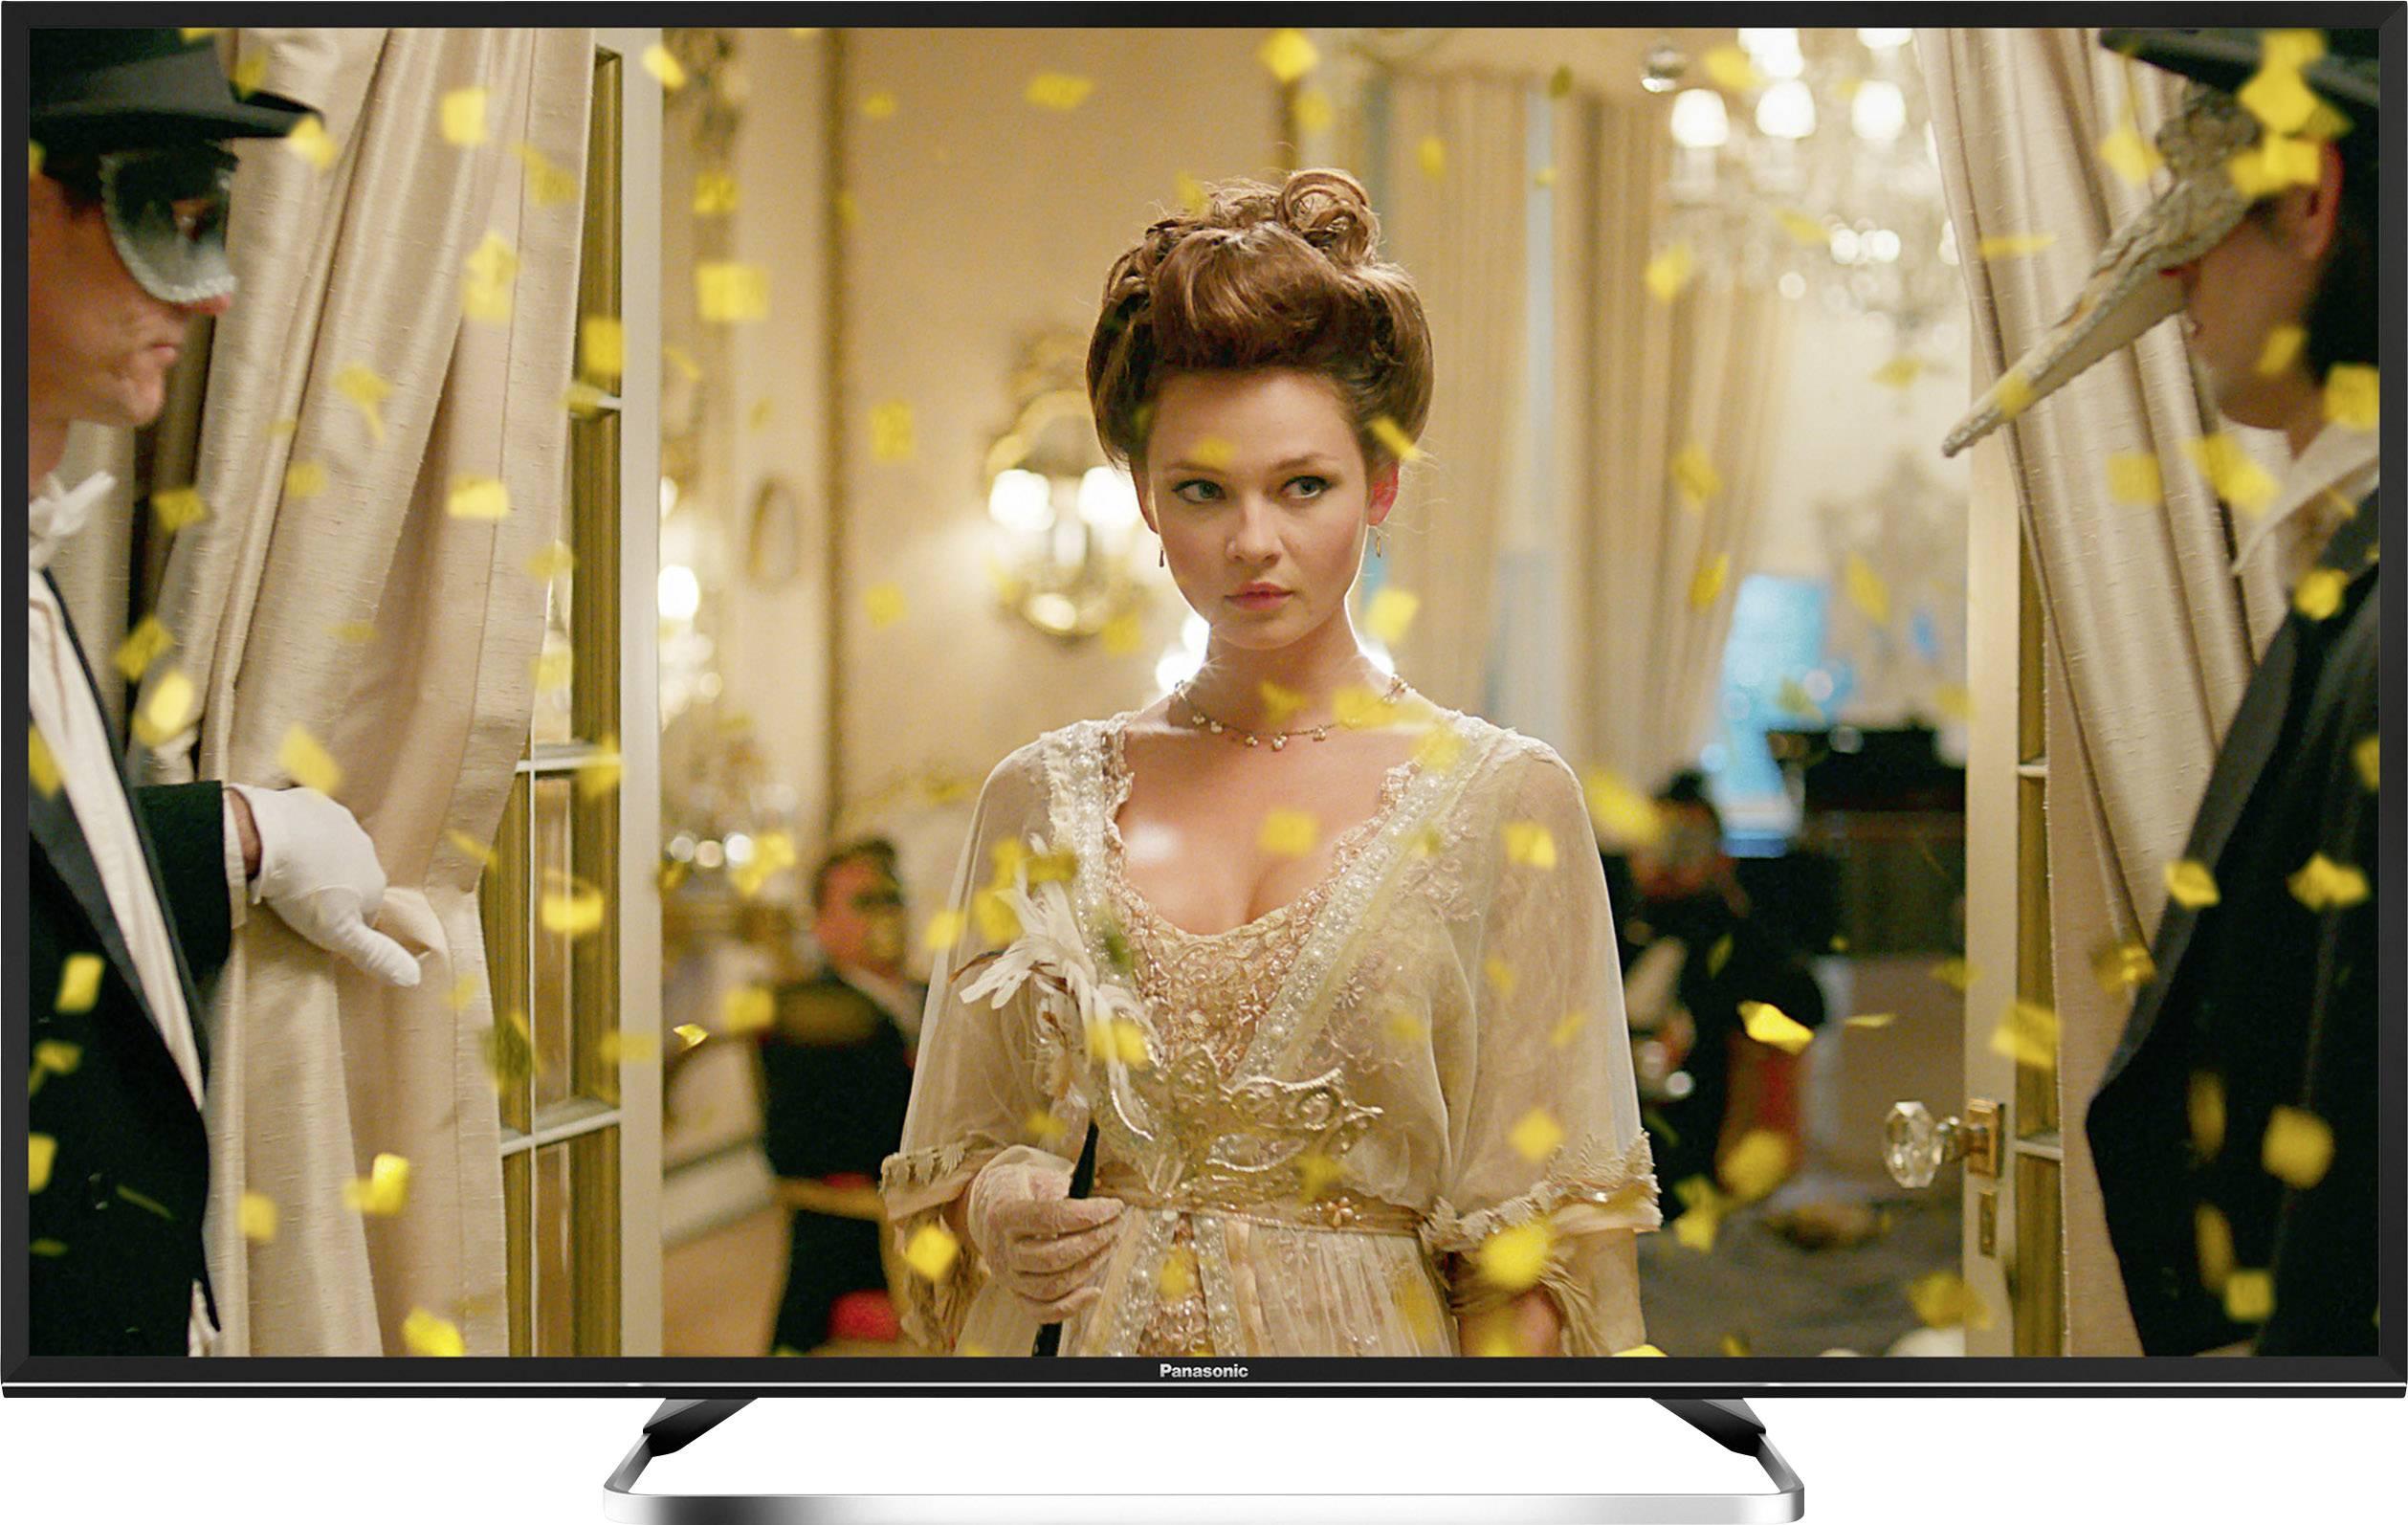 Panasonic VIERA TX-49FSW504 LED TV 123 cm 49